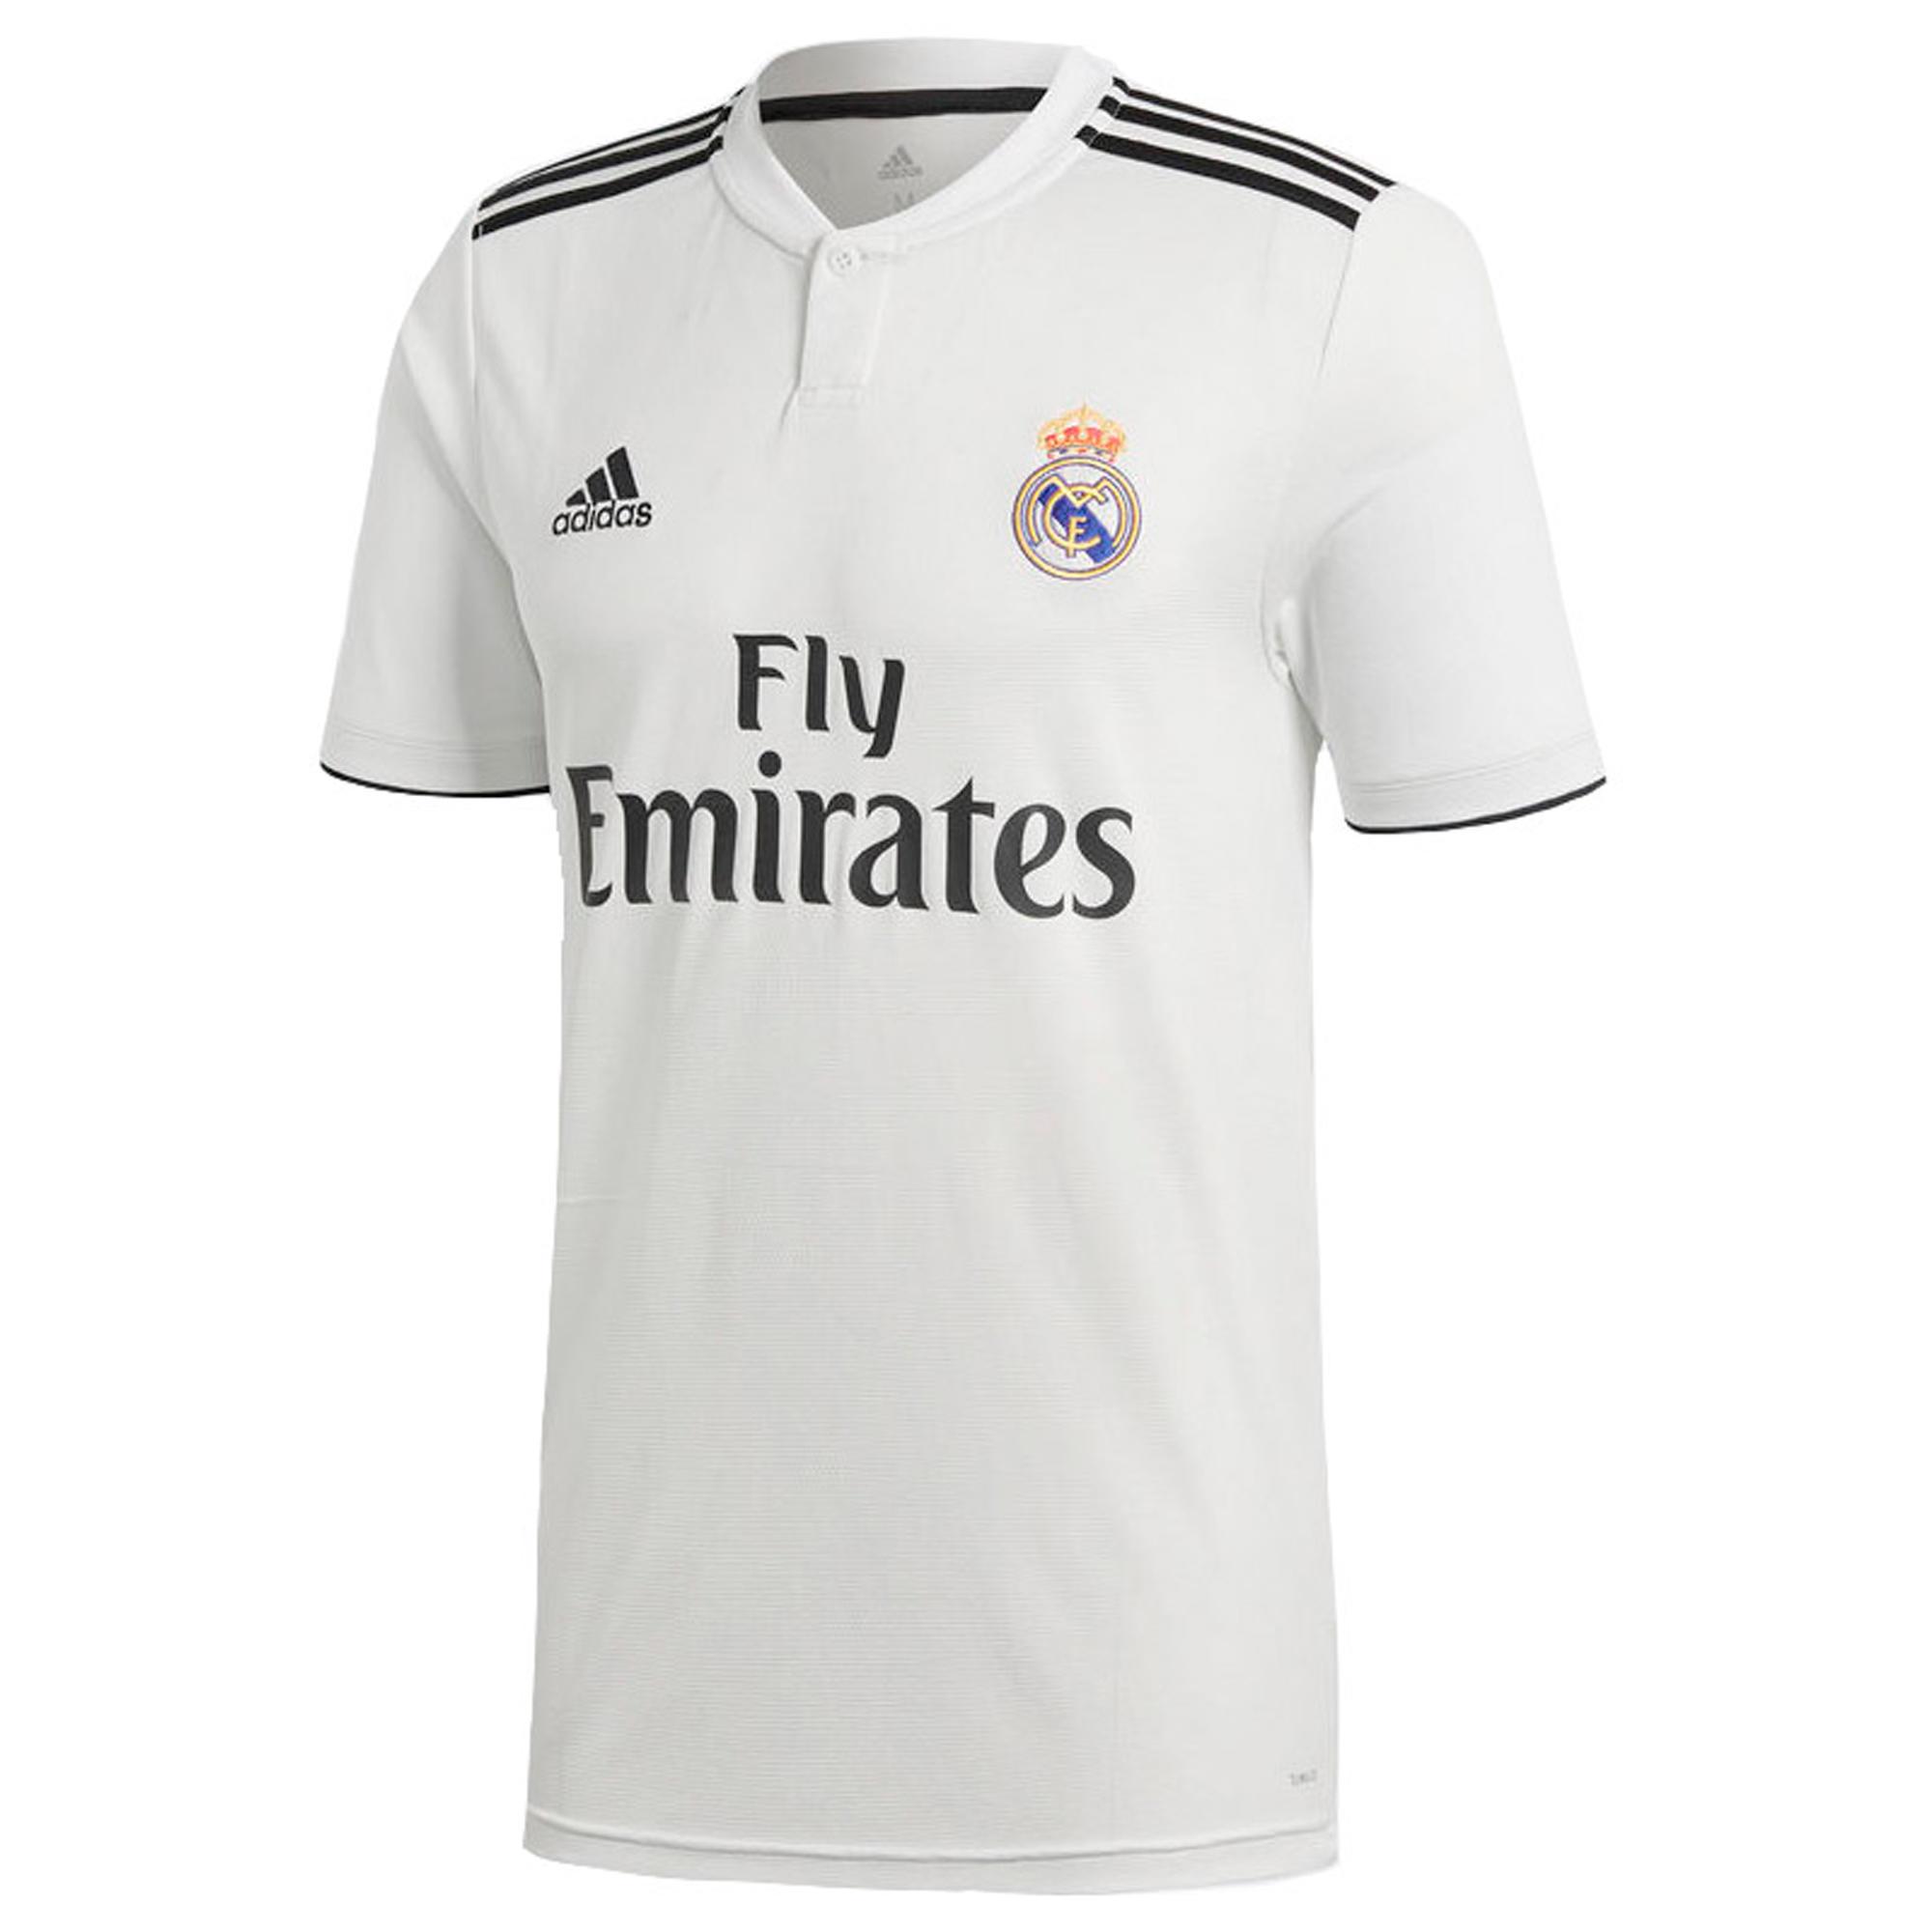 ba969363 Camisetas de Fútbol Réplicas | Decathlon